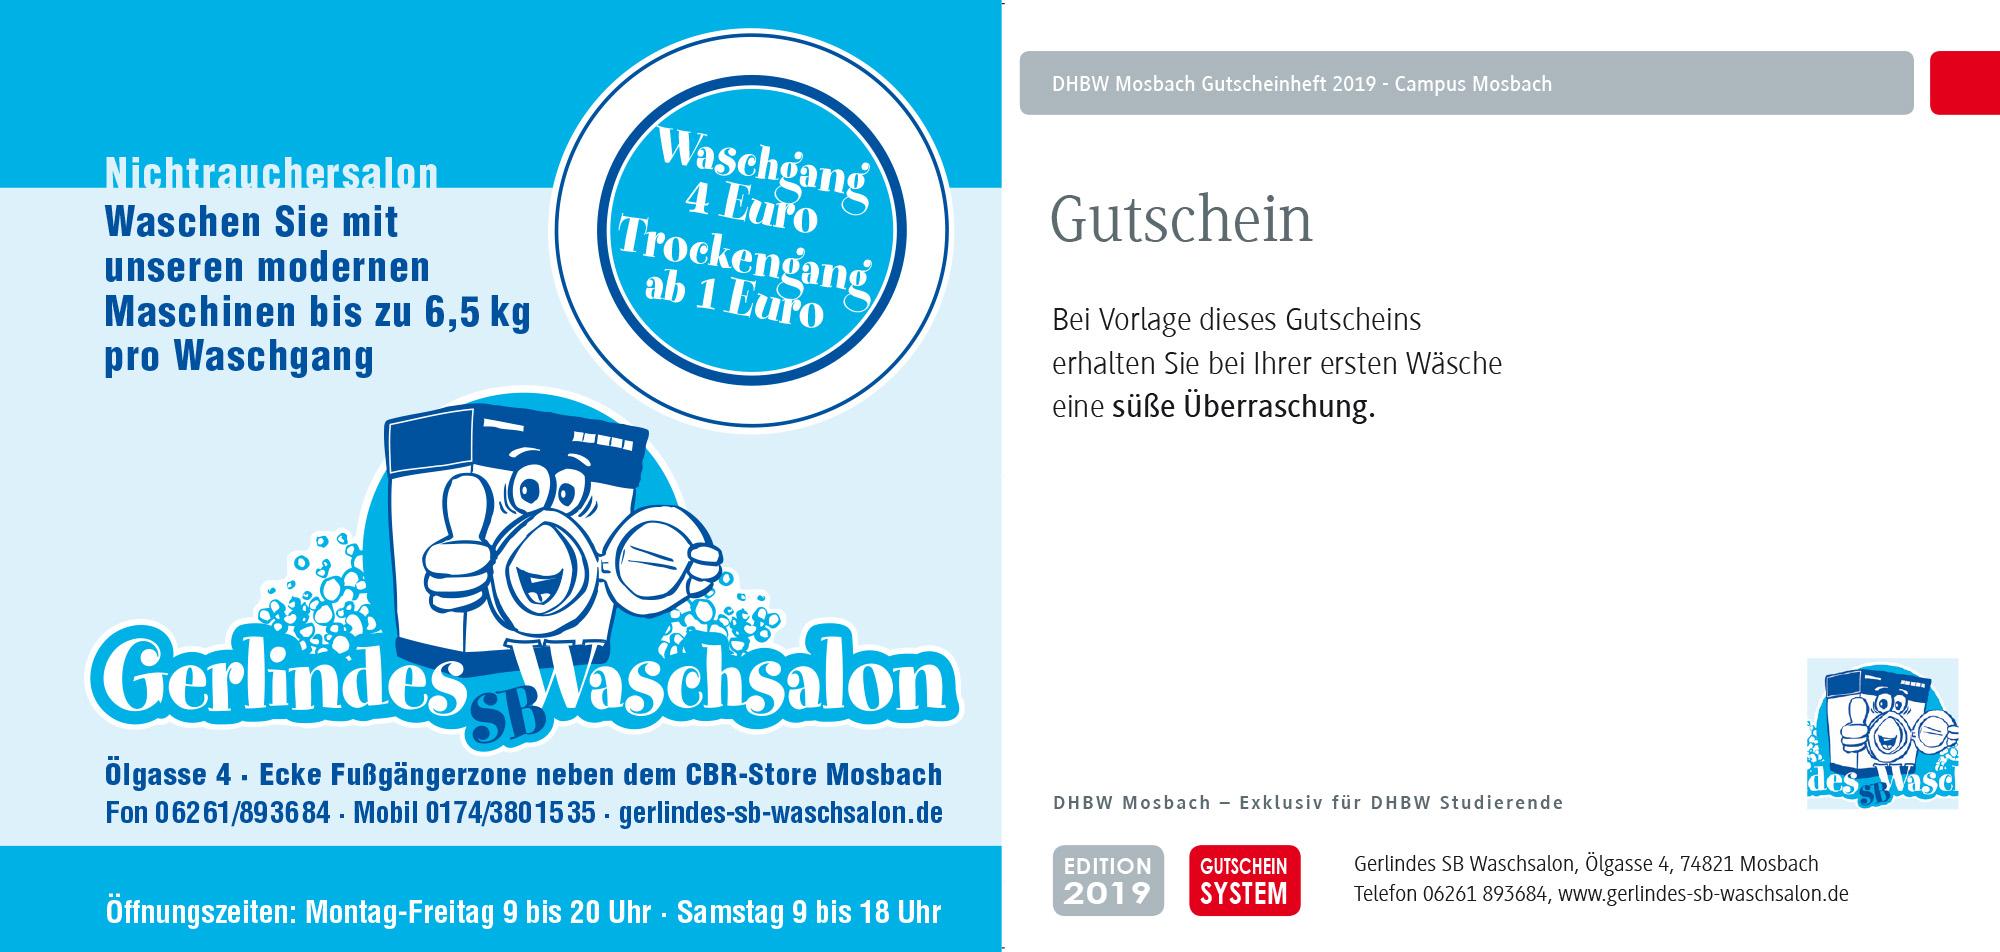 DHBW Mosbach Coupon Waschsalon